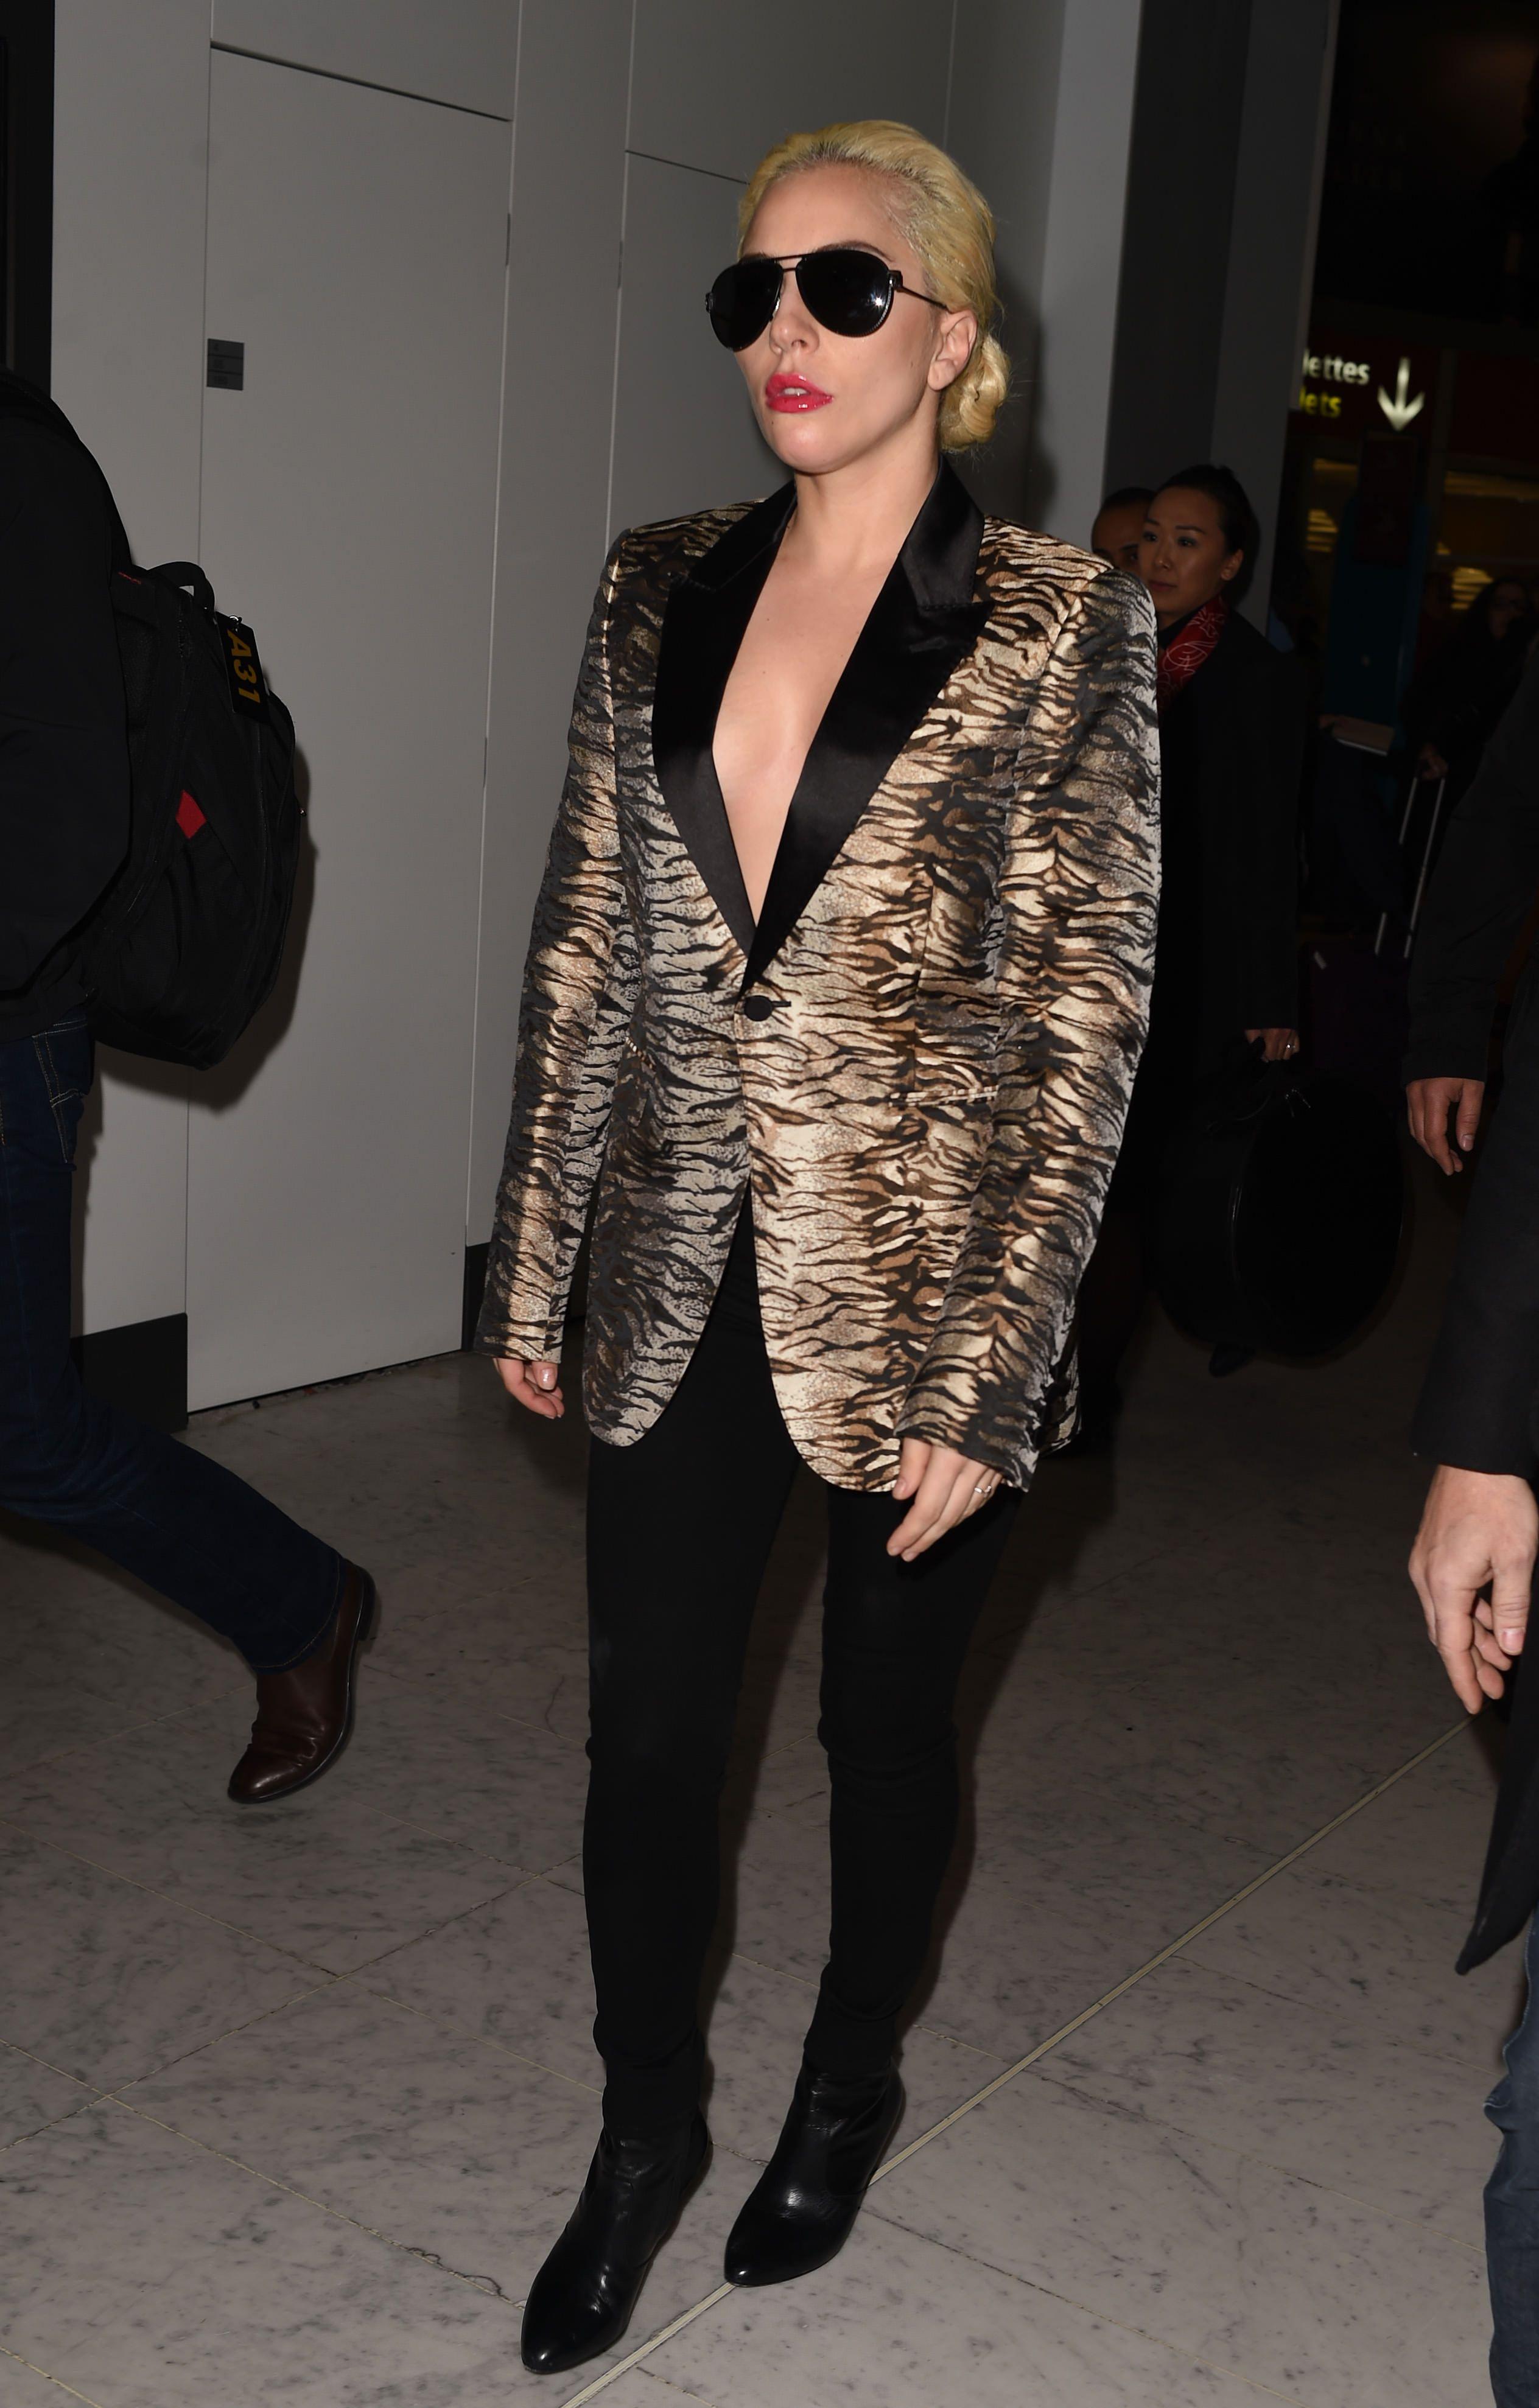 GaGa arriving in Paris, France (Nov. 27 2016)